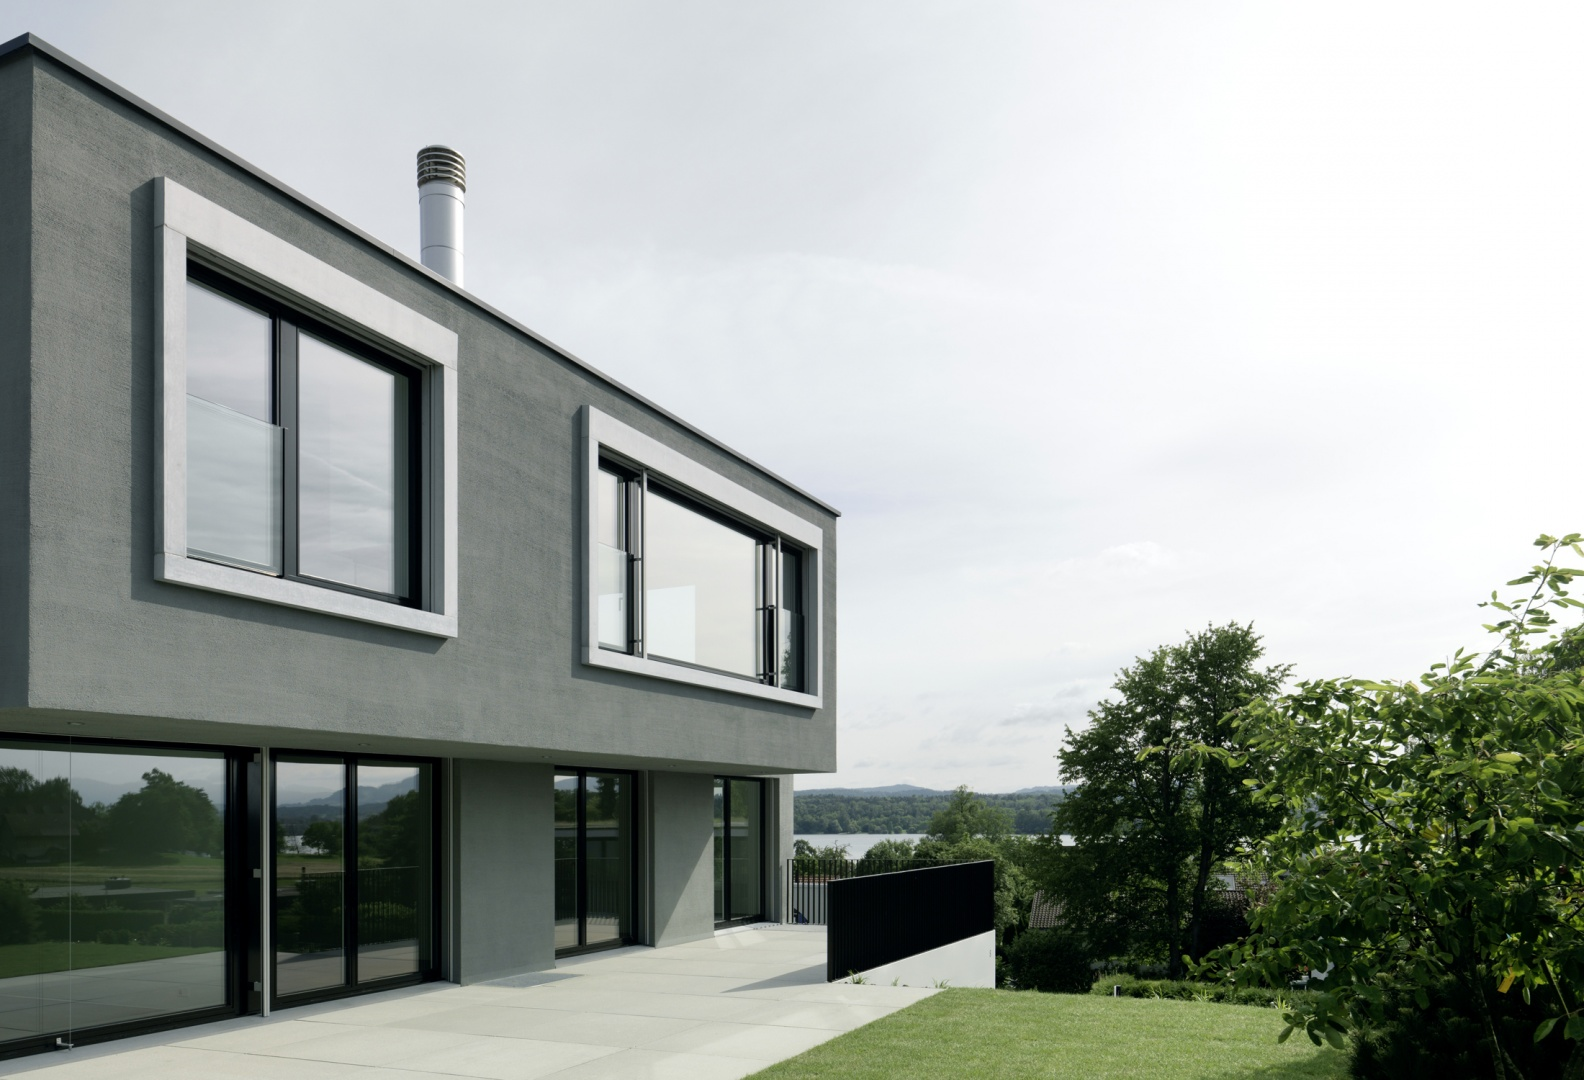 mehrfamilienhaus maur documentation suisse du batiment. Black Bedroom Furniture Sets. Home Design Ideas